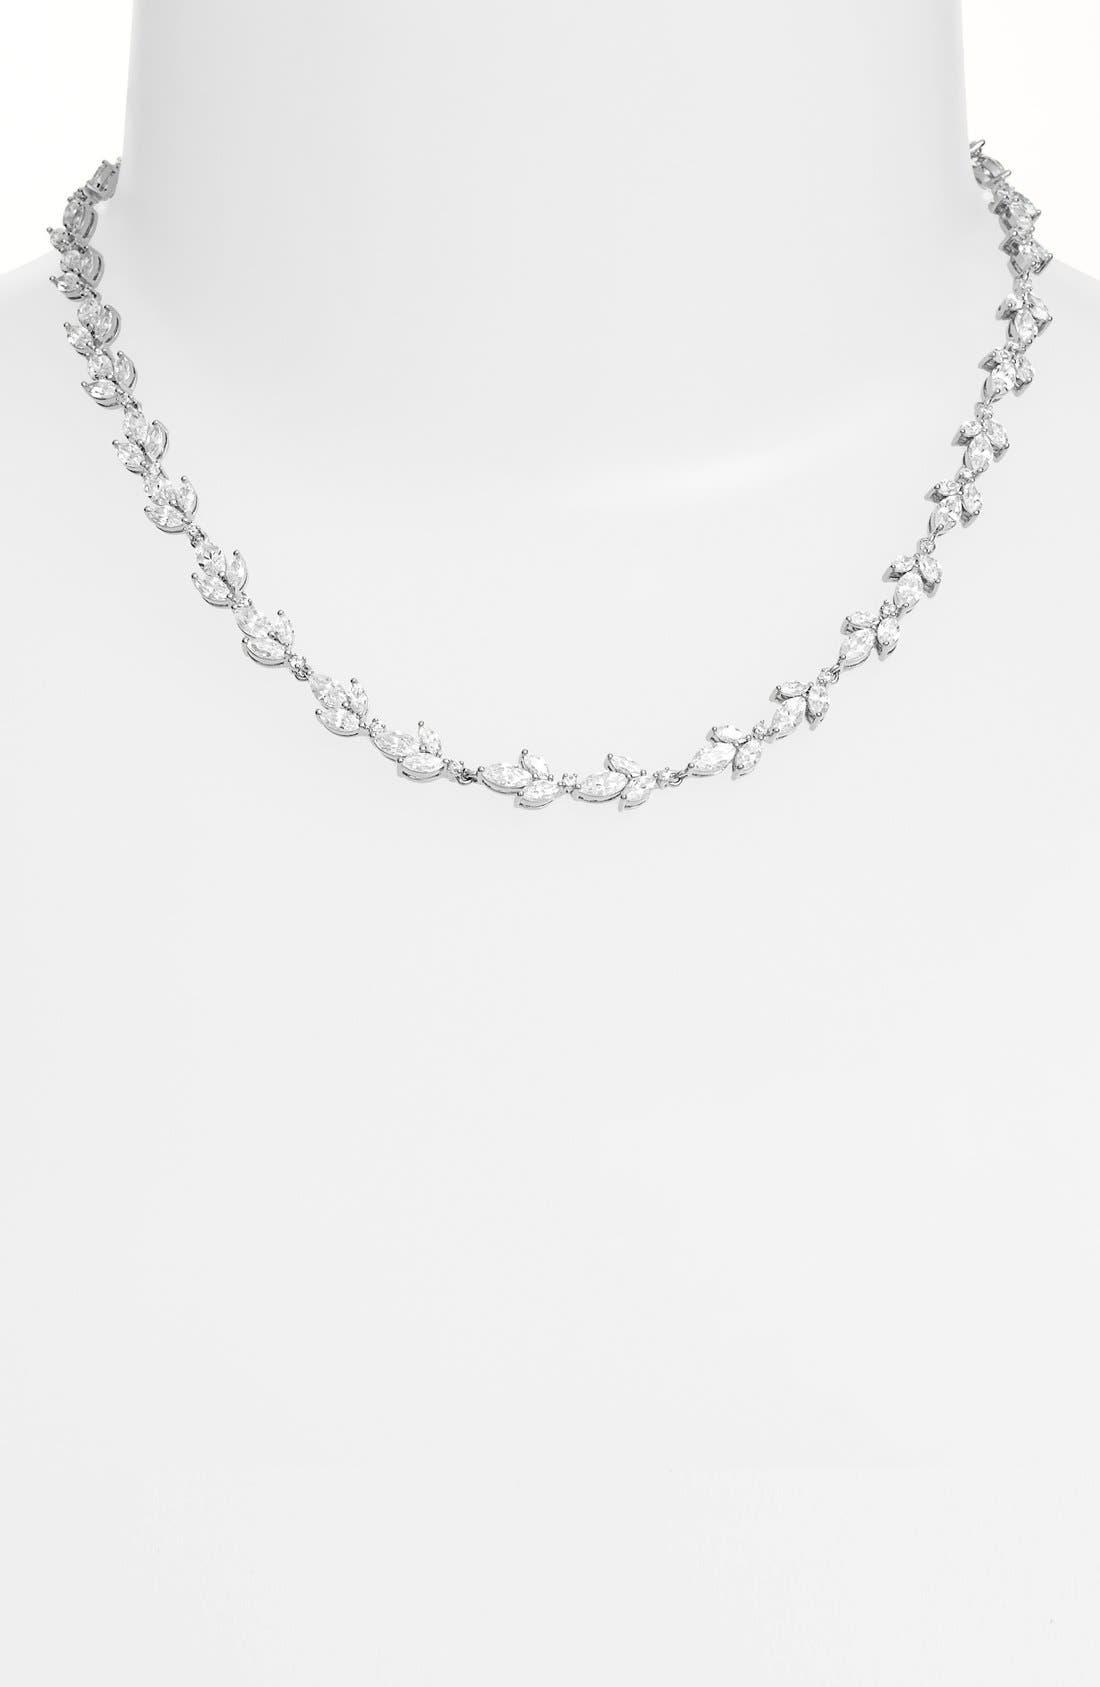 Main Image - Nadri 'Bloom' Cubic Zirconia Collar Necklace